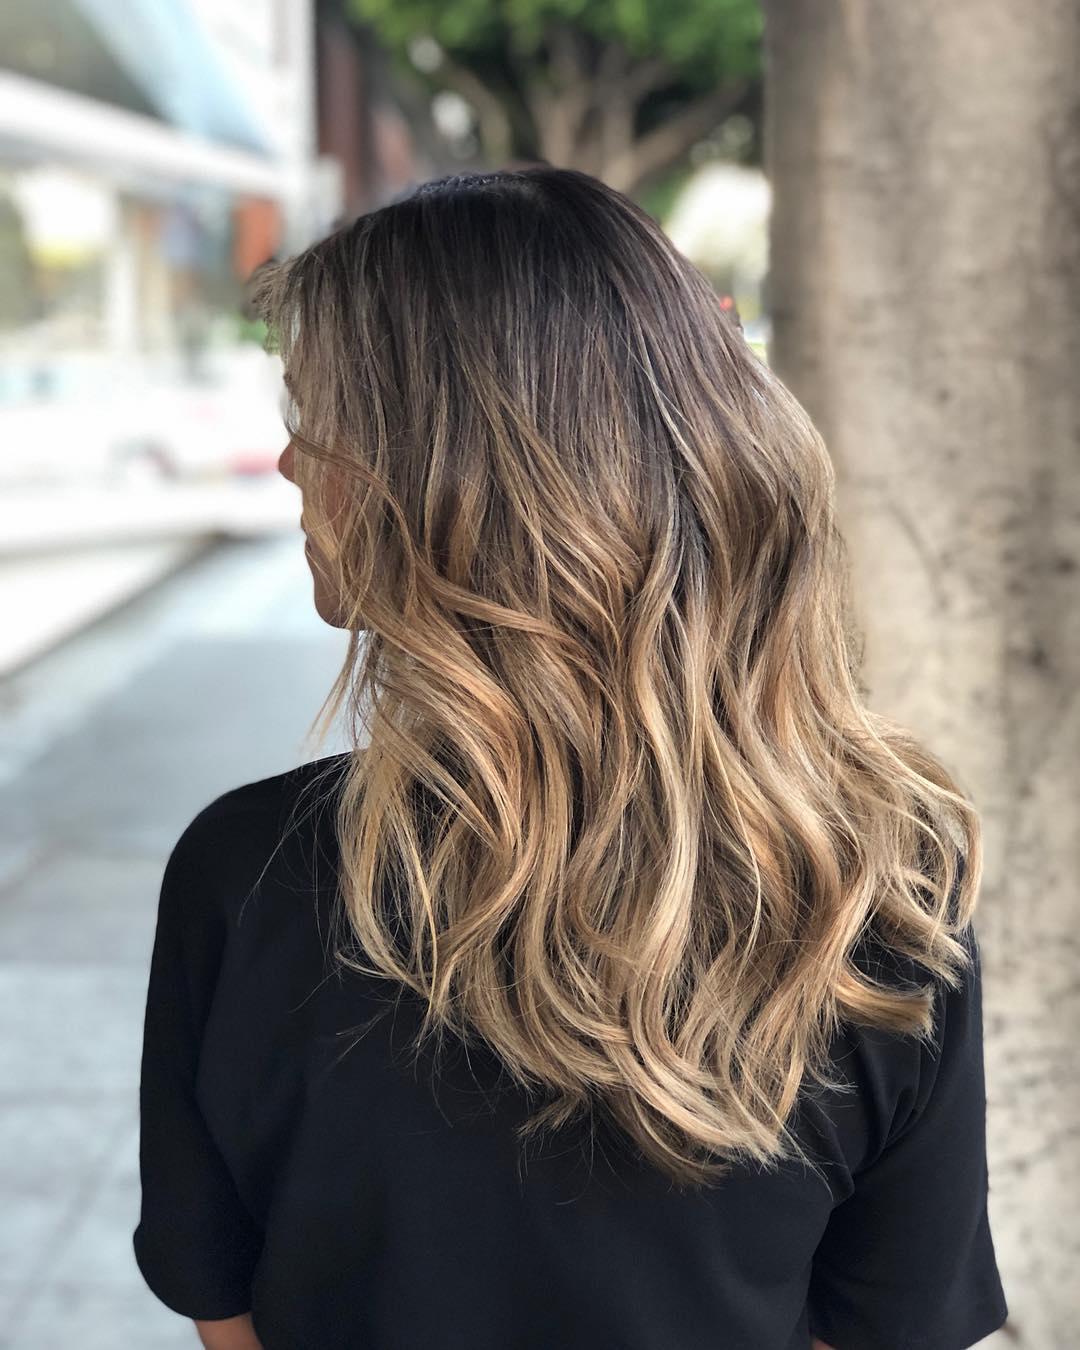 Окрашивание волос зима 2019-2020 фото 3